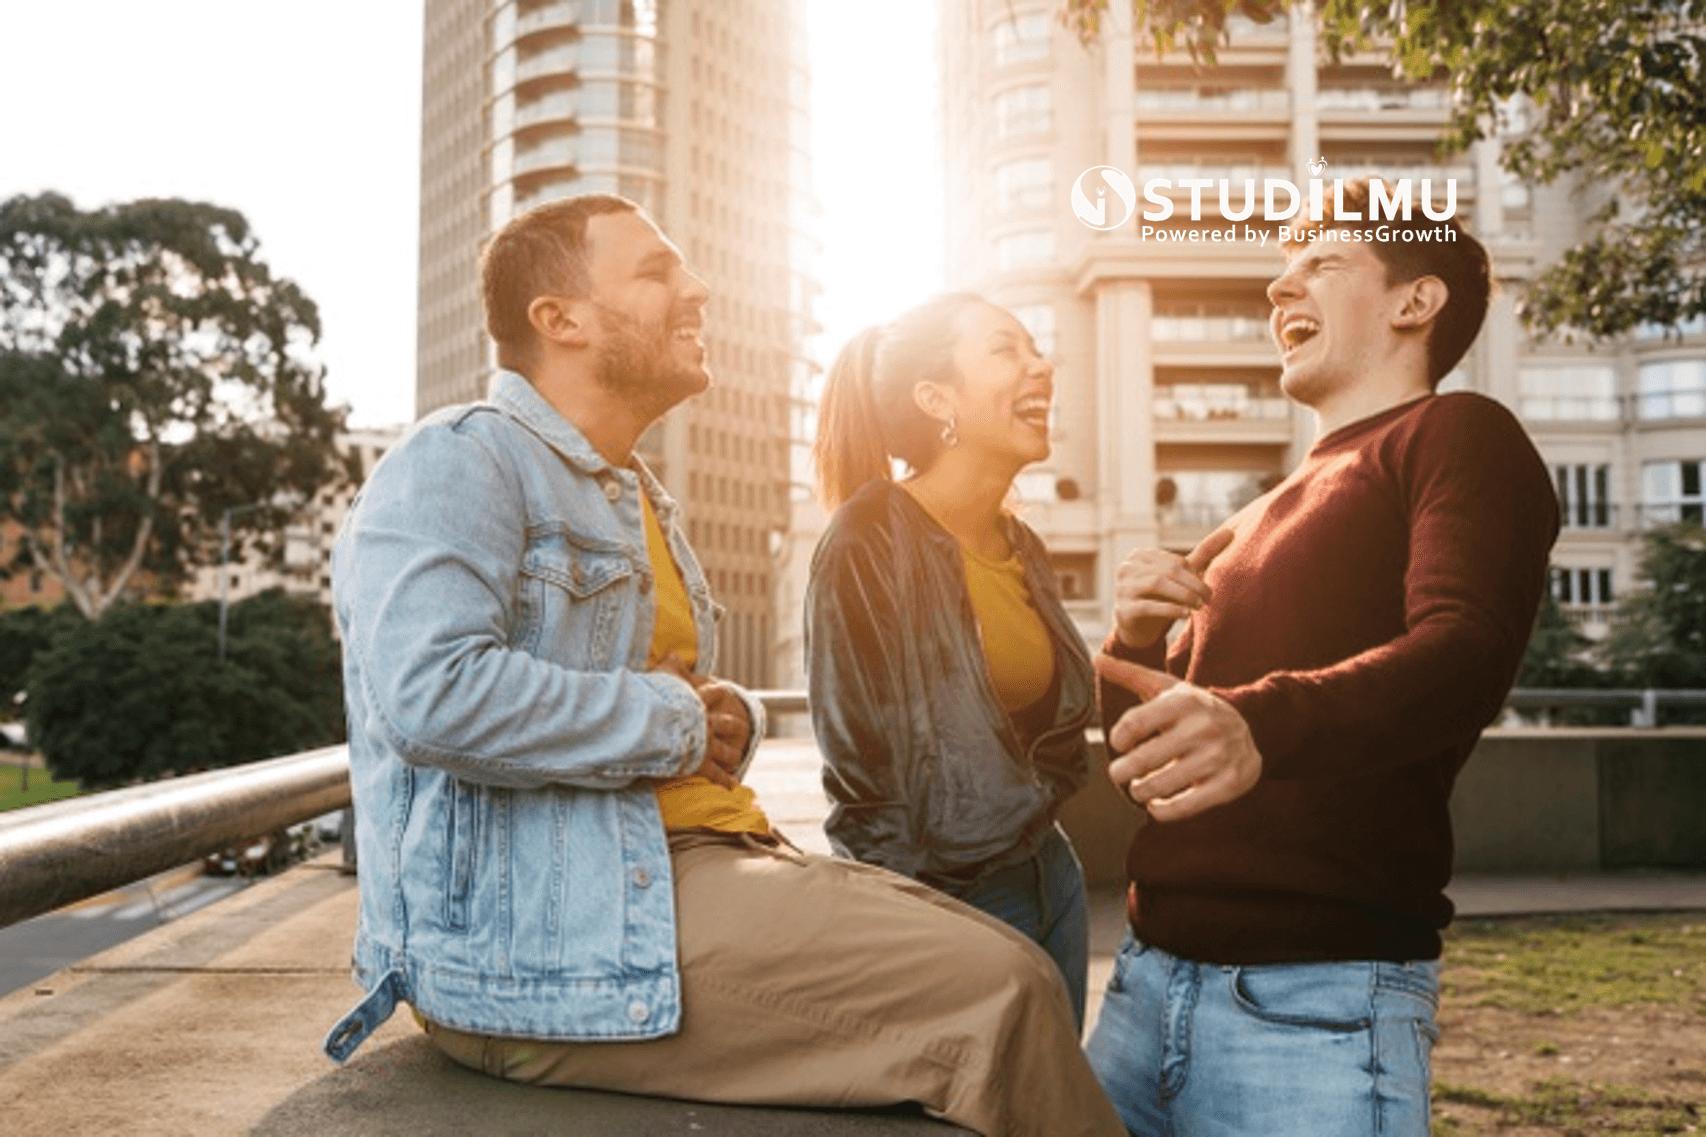 STUDILMU Career Advice - 7 Kebiasaan Utama untuk Meraih Kebahagiaan Sejati